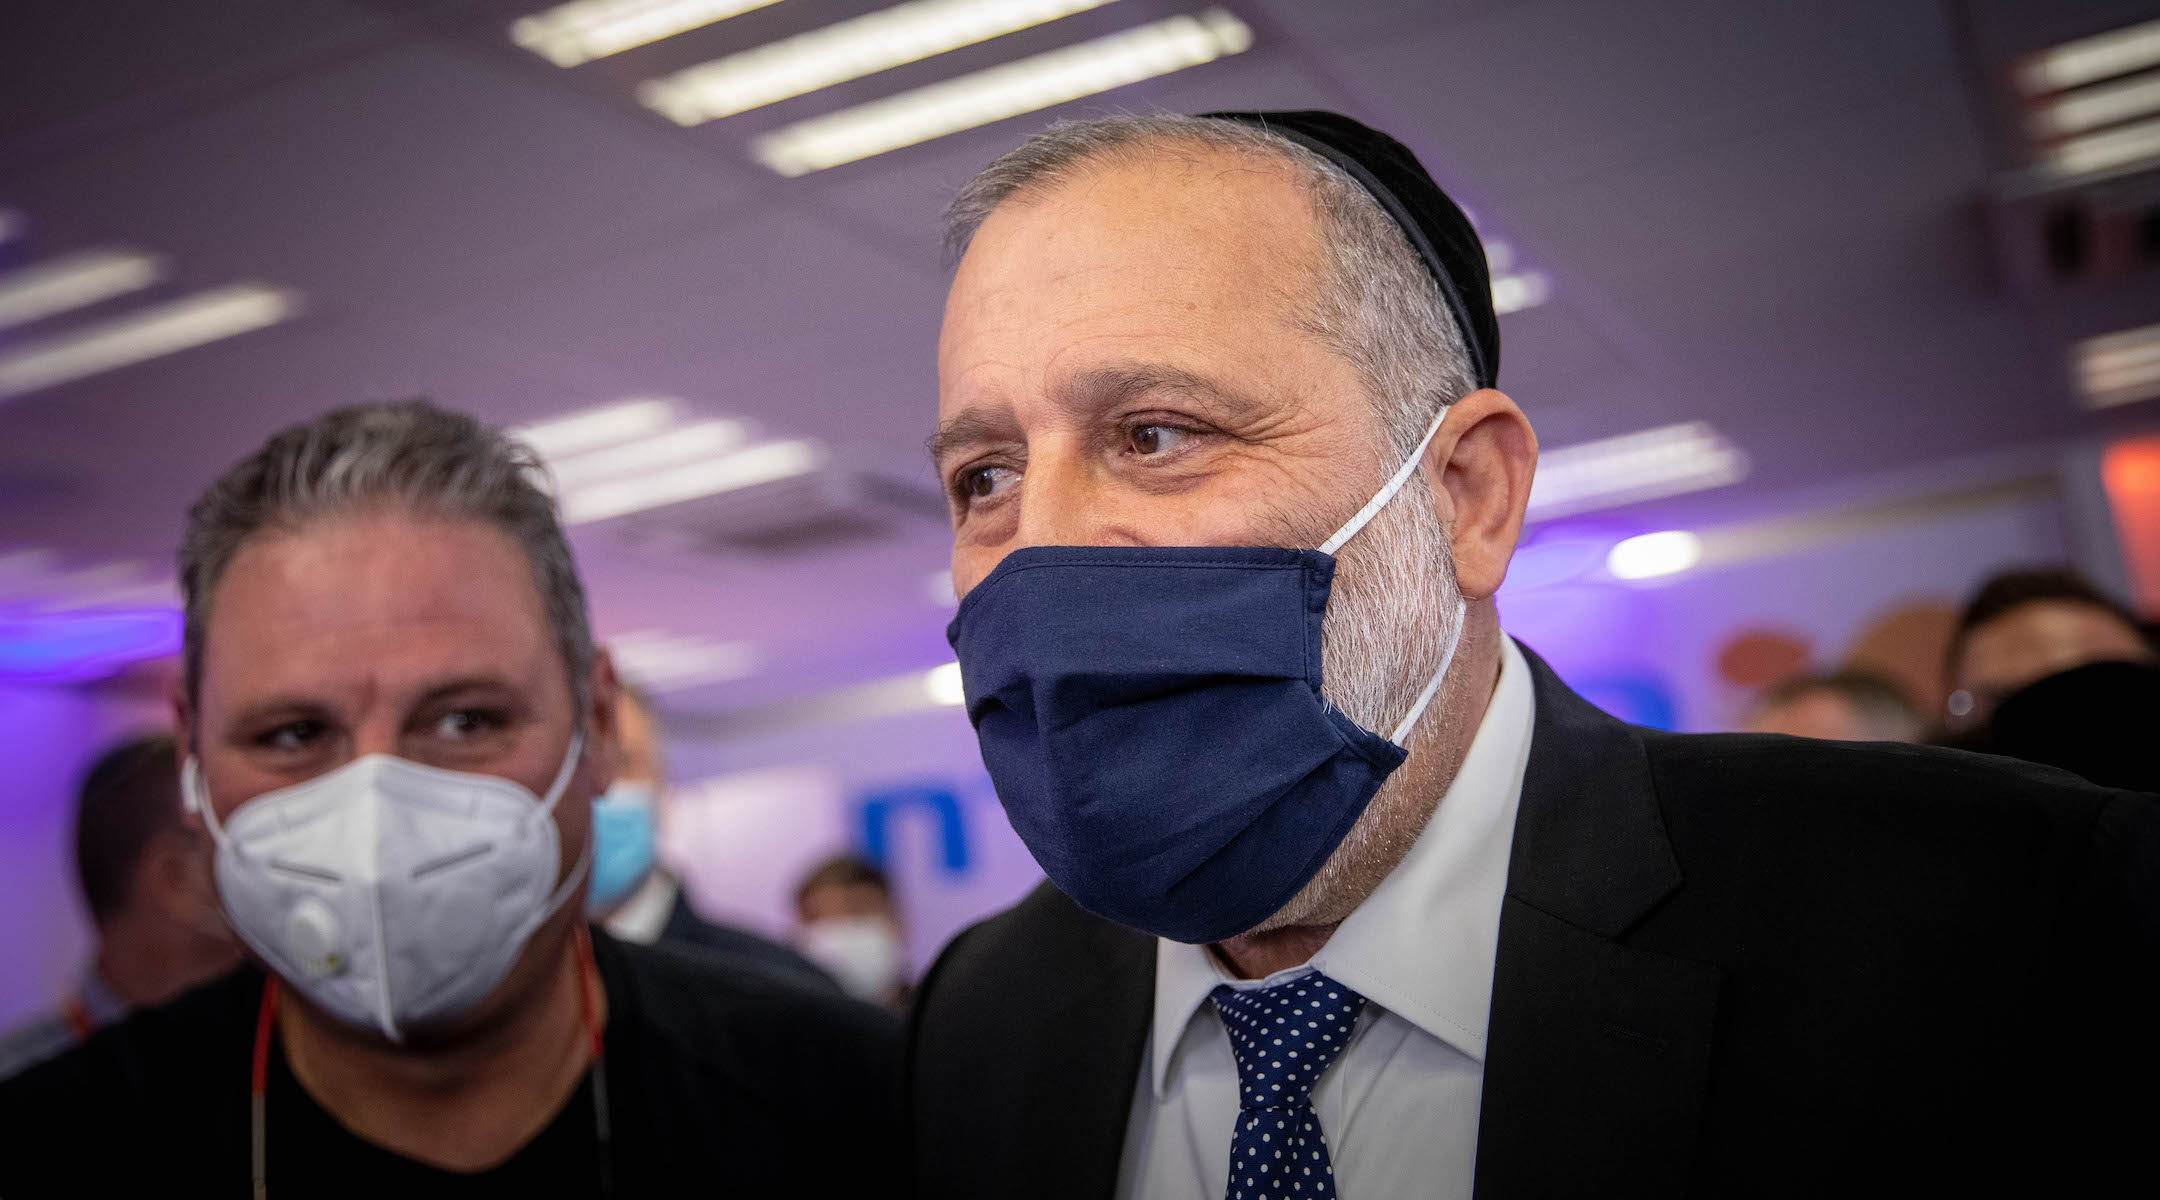 Aryeh Deri, leader of the Sephardi Haredi Shas Party, seen in Jerusalem in December 2020. (Yonatan Sindel/Flash90)